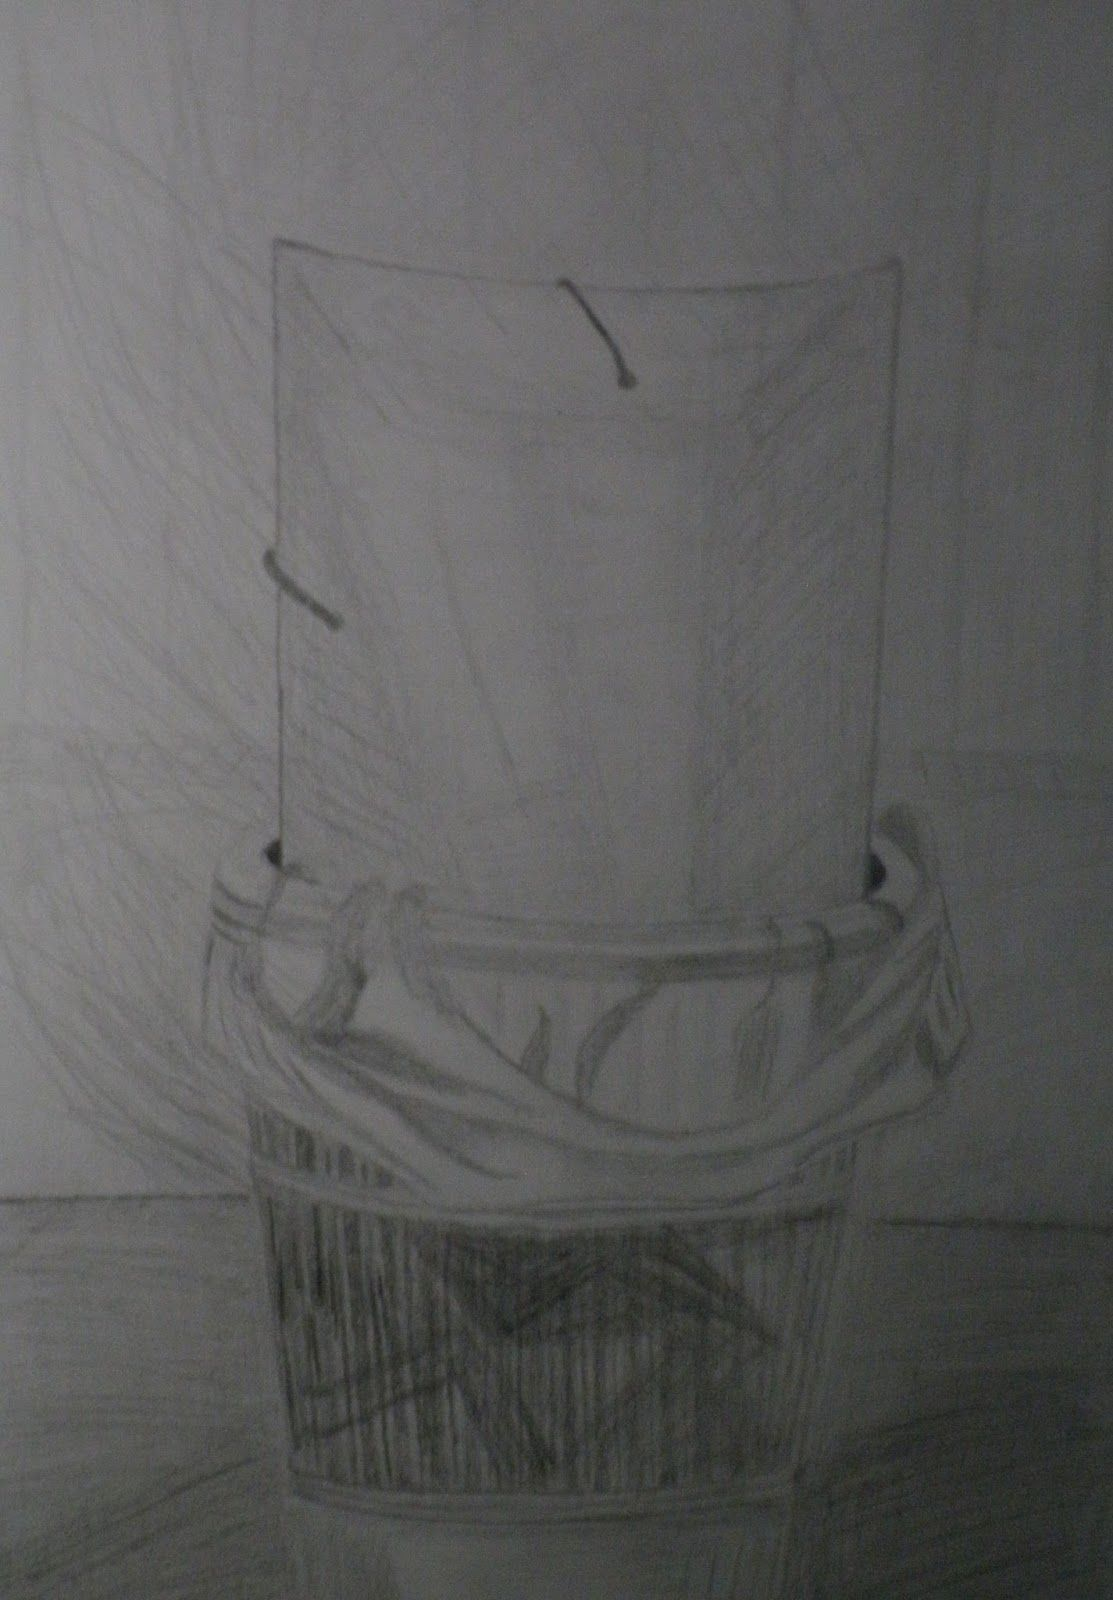 http://thecreativeact1.blogspot.gr/p/free-hand-drawing.html